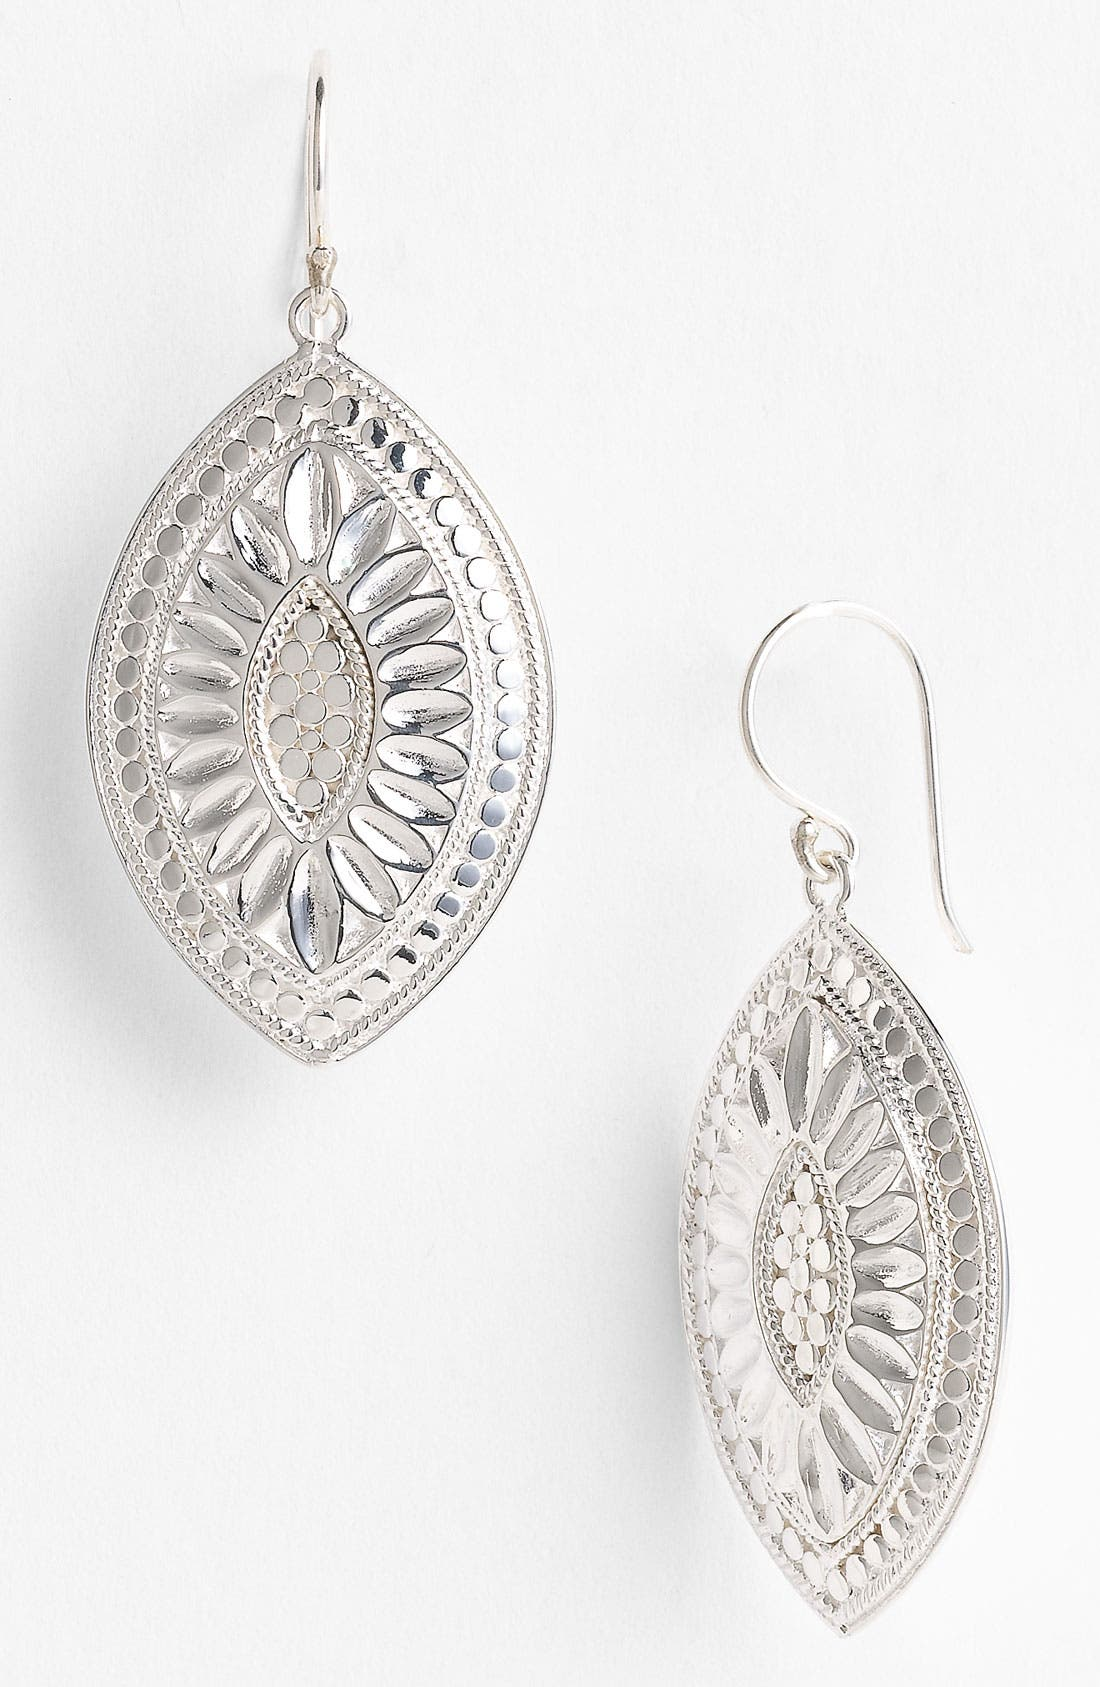 Alternate Image 1 Selected - Anna Beck 'Leaf' Medium Drop Earrings (Nordstrom Exclusive)